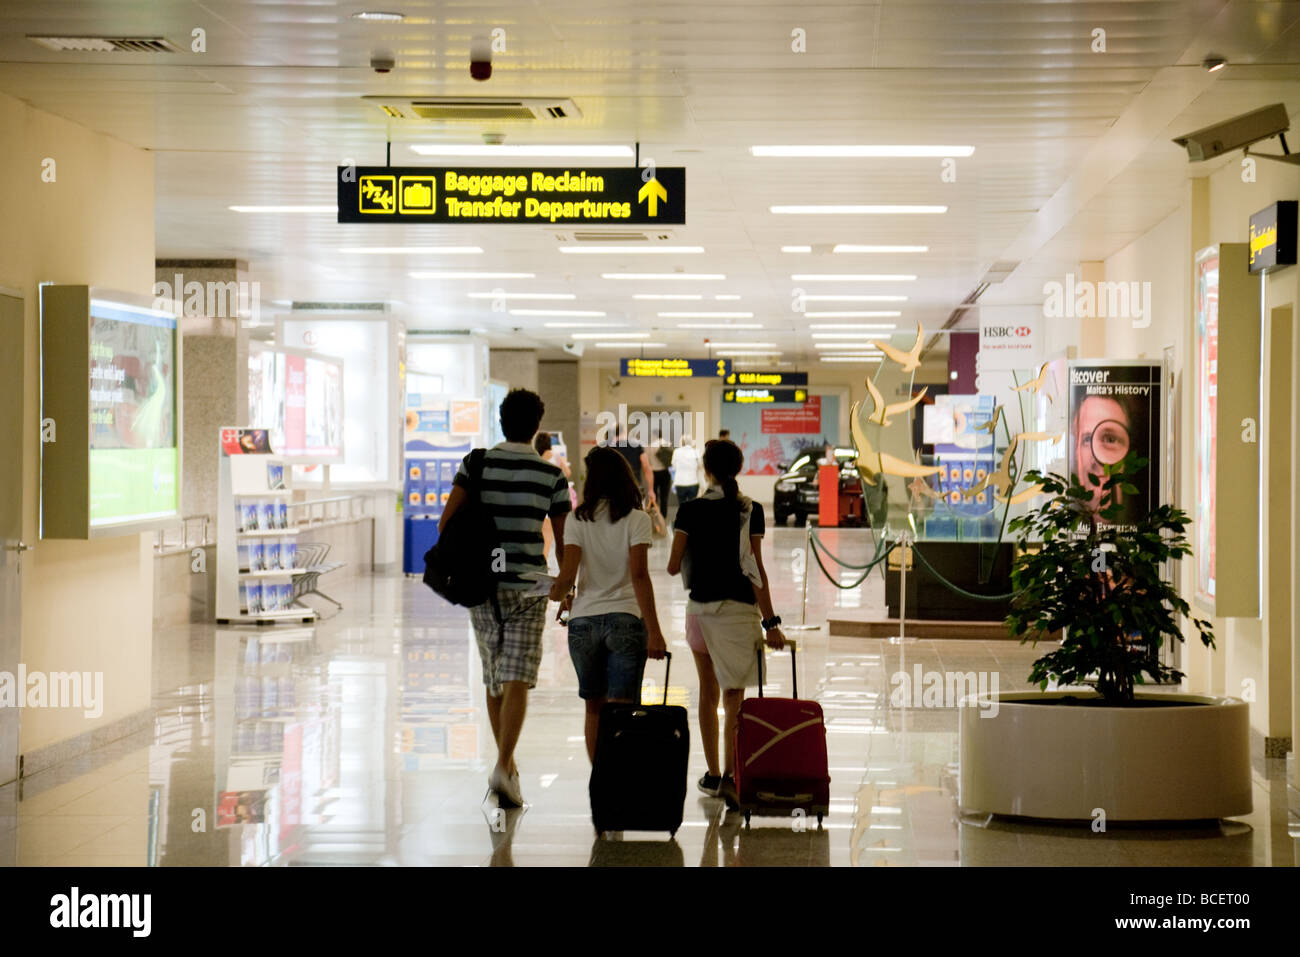 Arriving passengers make their way to baggage reclaim, Malta airport - Stock Image